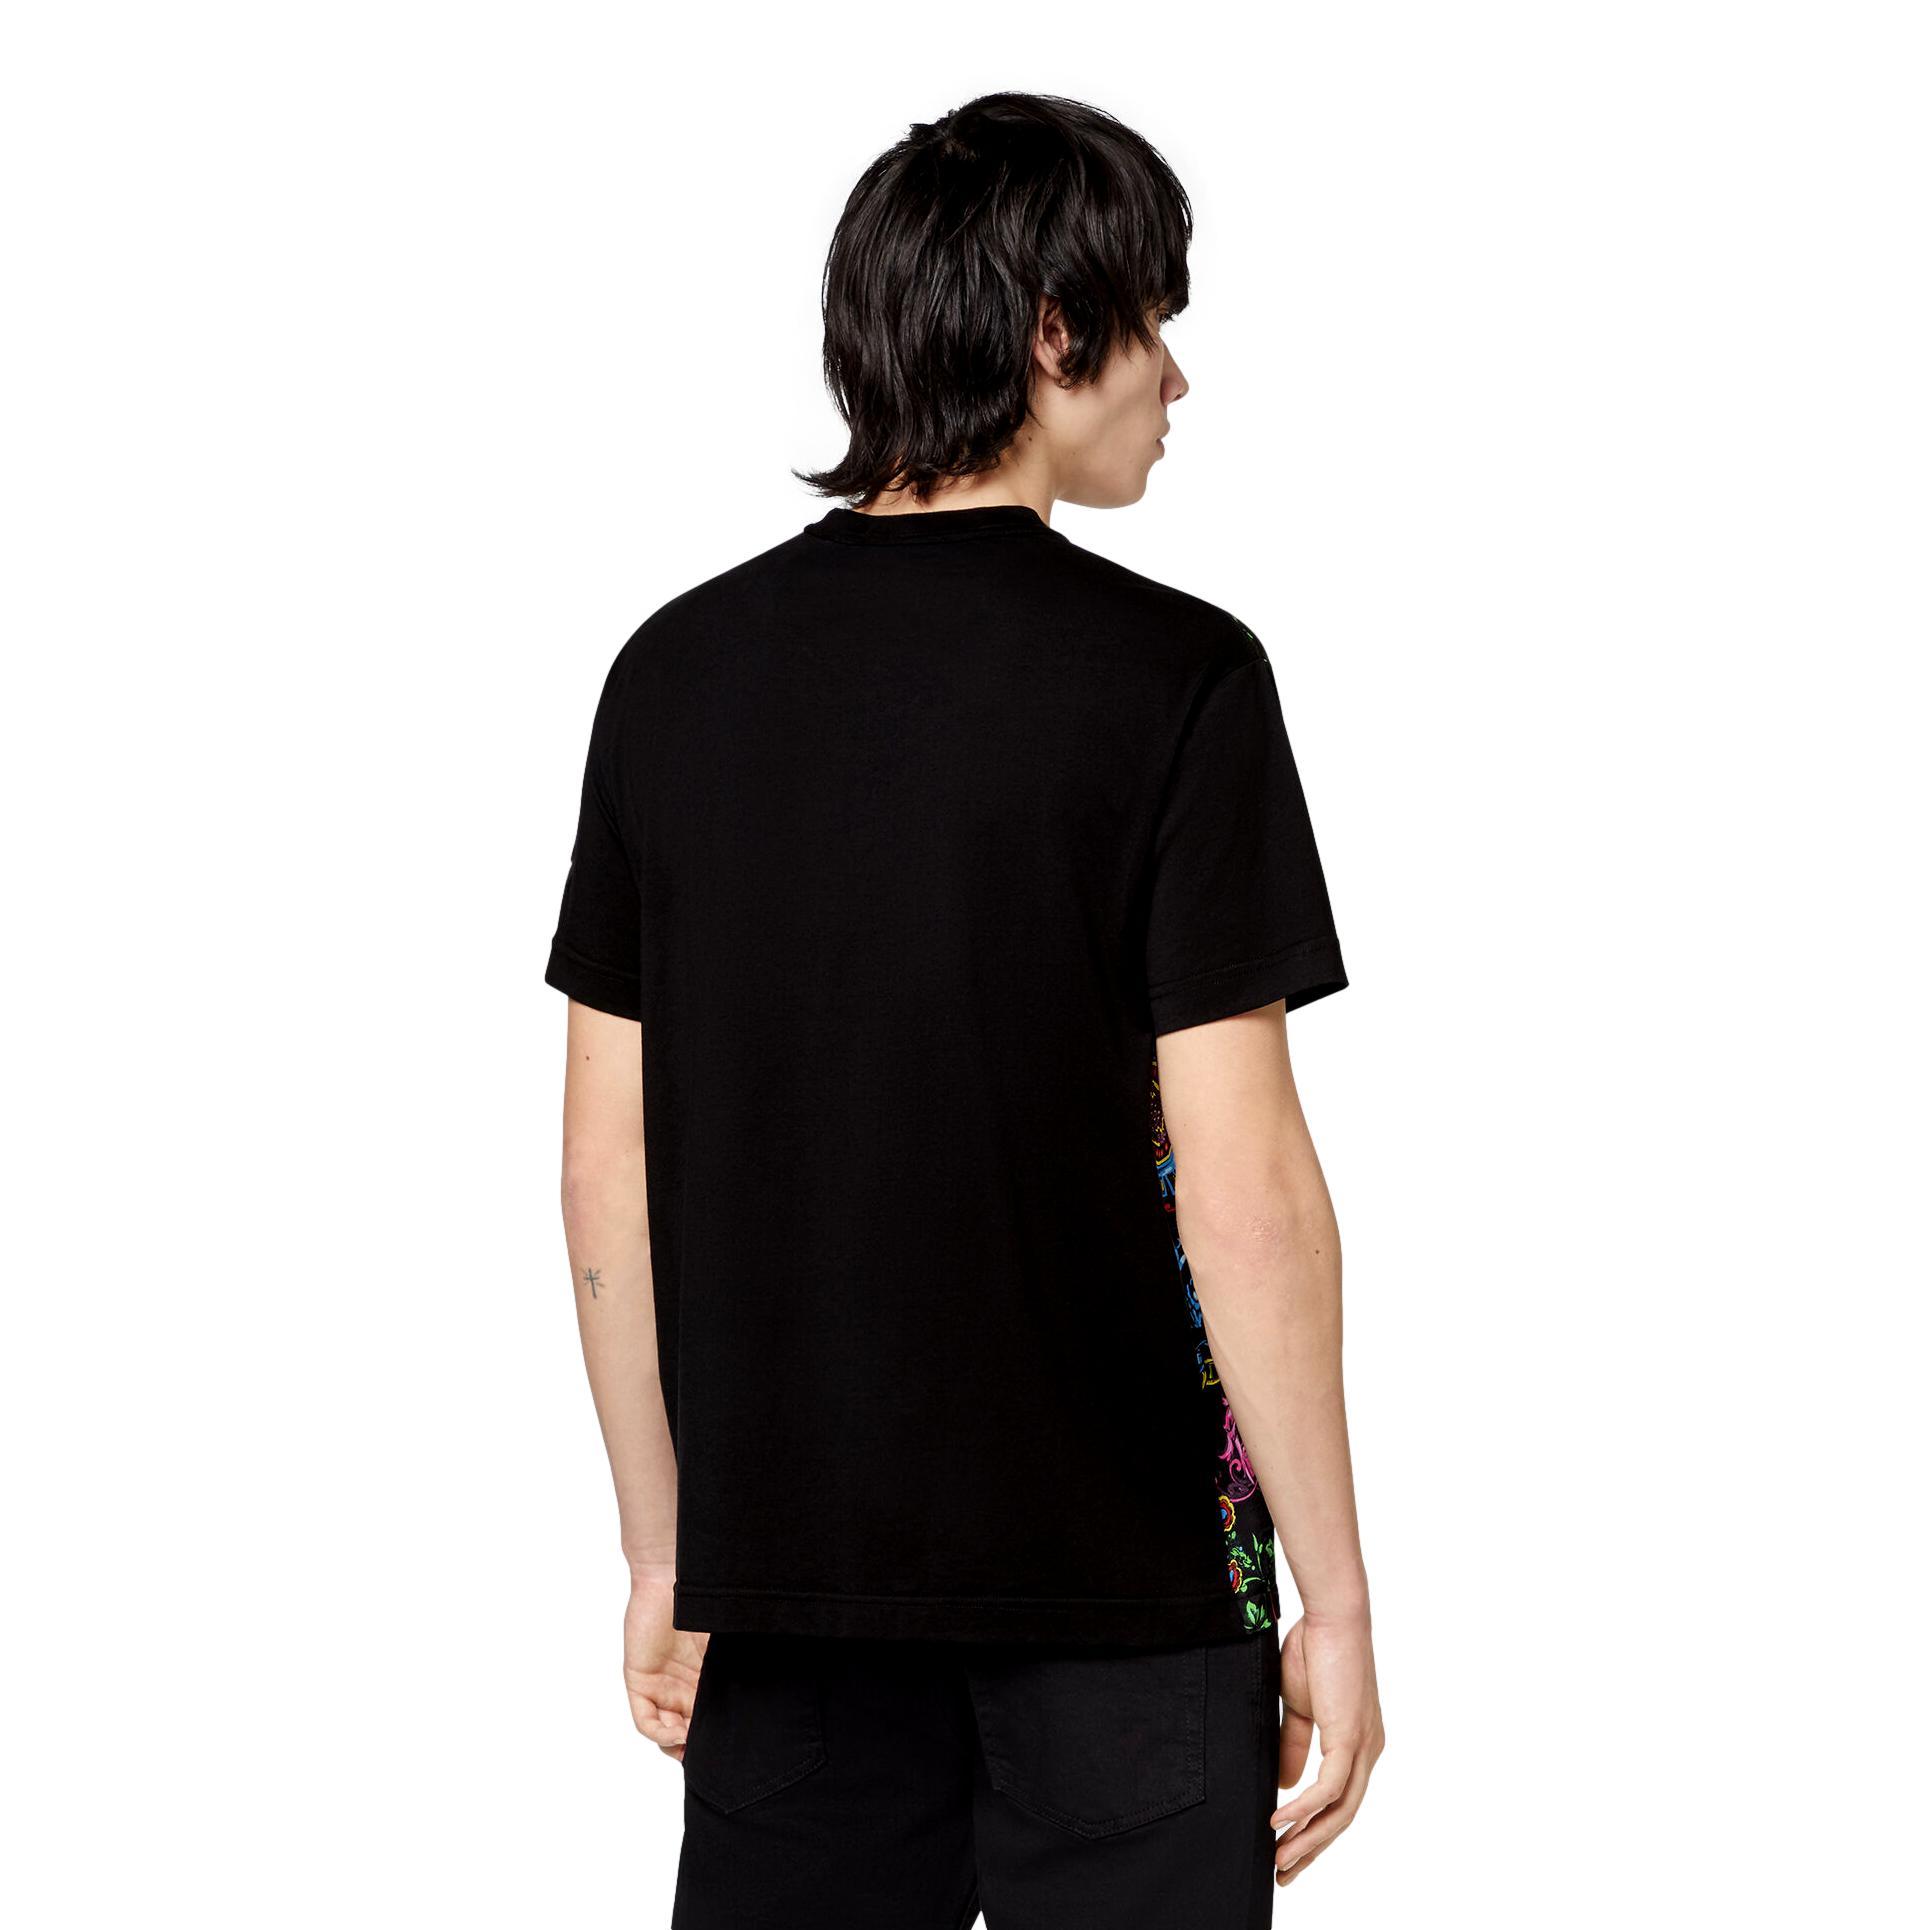 T-SHIRT CON STAMPA REGALIA BAROQUE VERSACE JEANS COUTURE   T-shirt   71GAH610 NS007899